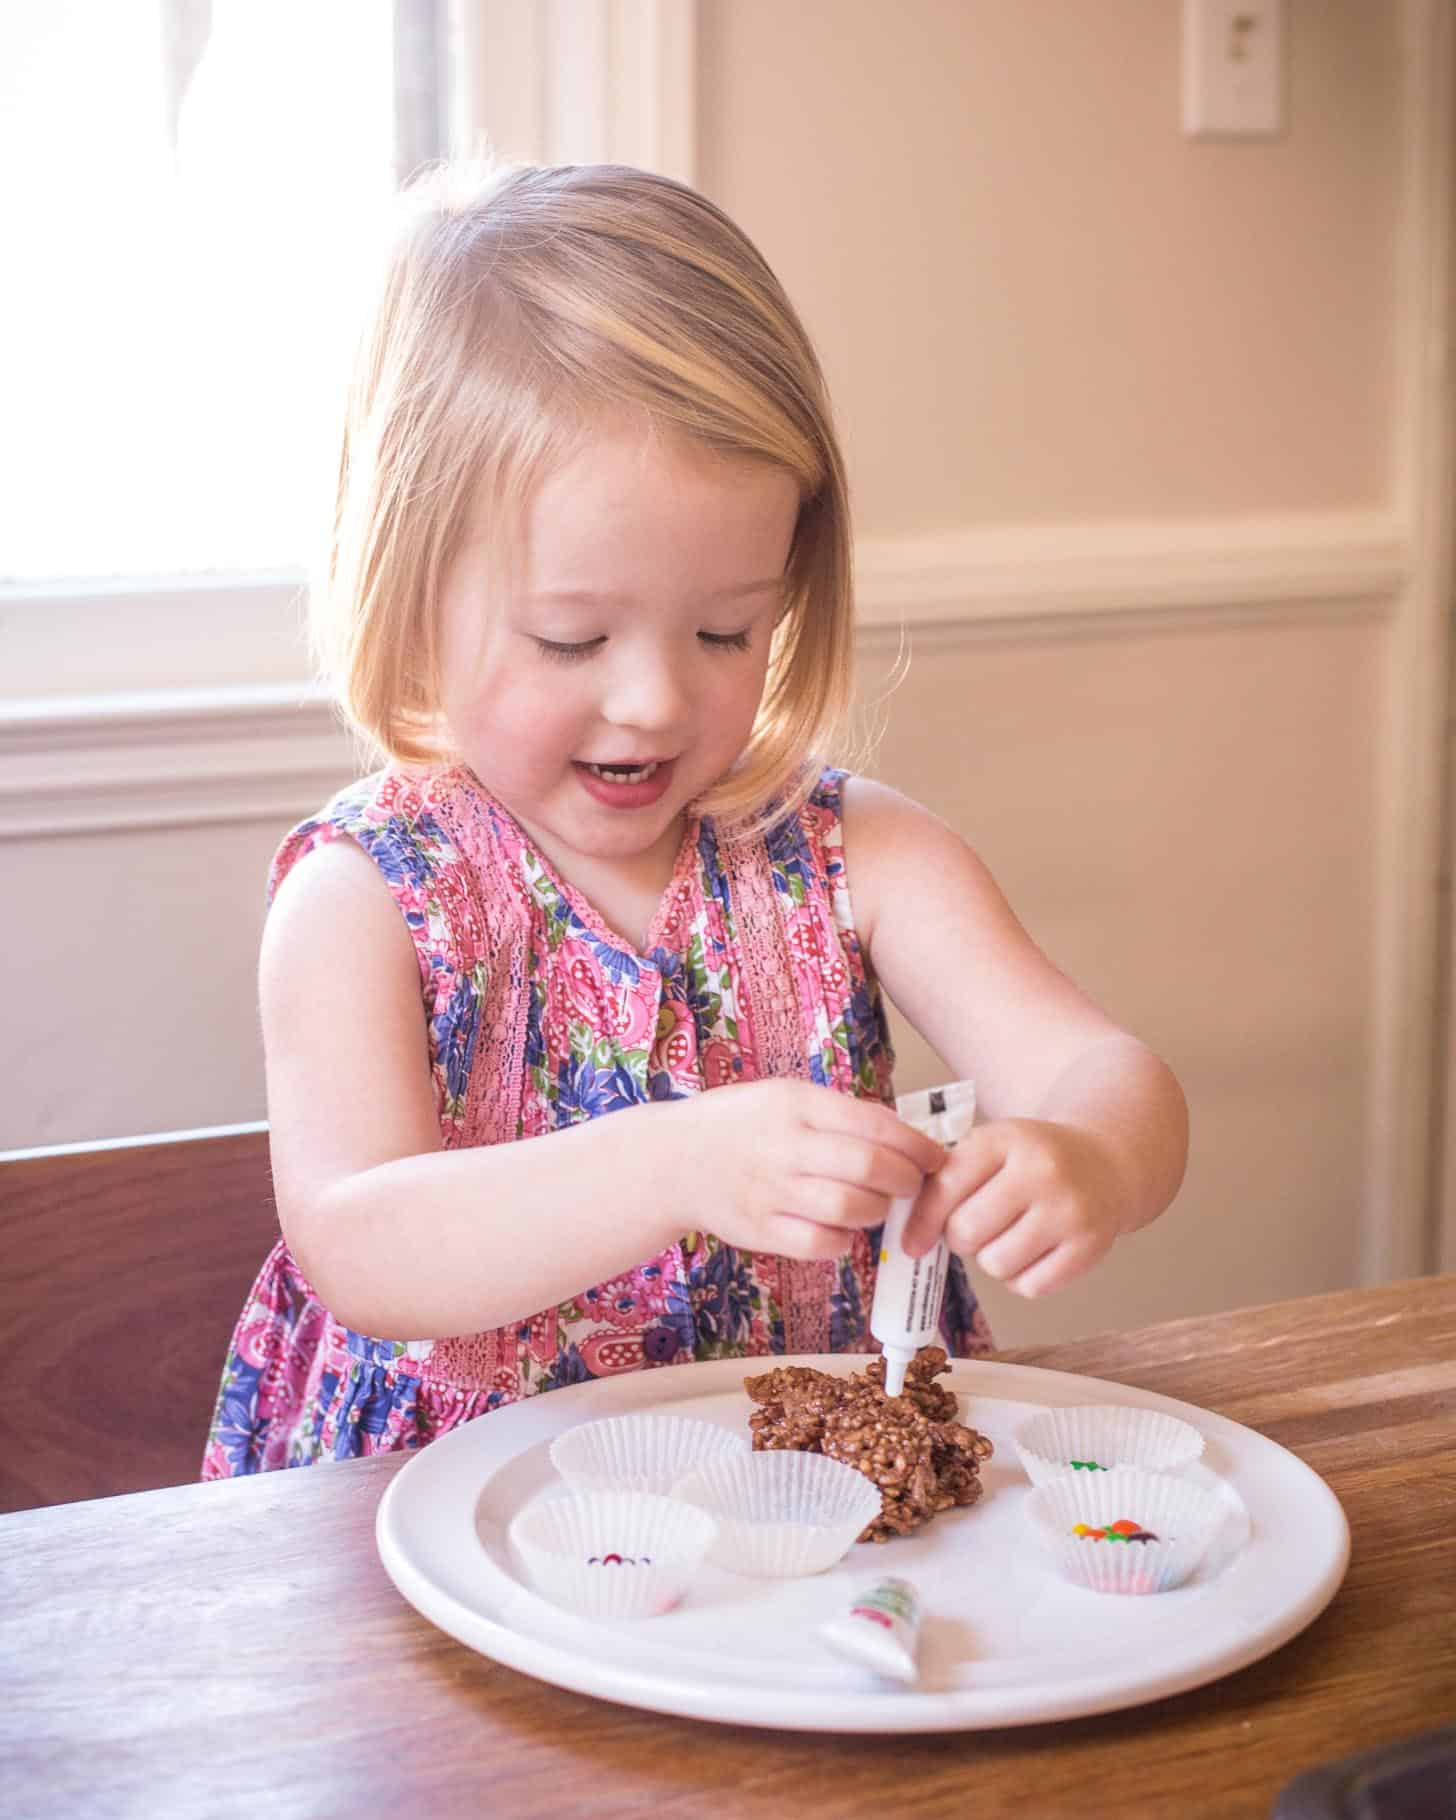 Clara decorating Chocolate Rice Krispies Treats Gingerbread Men